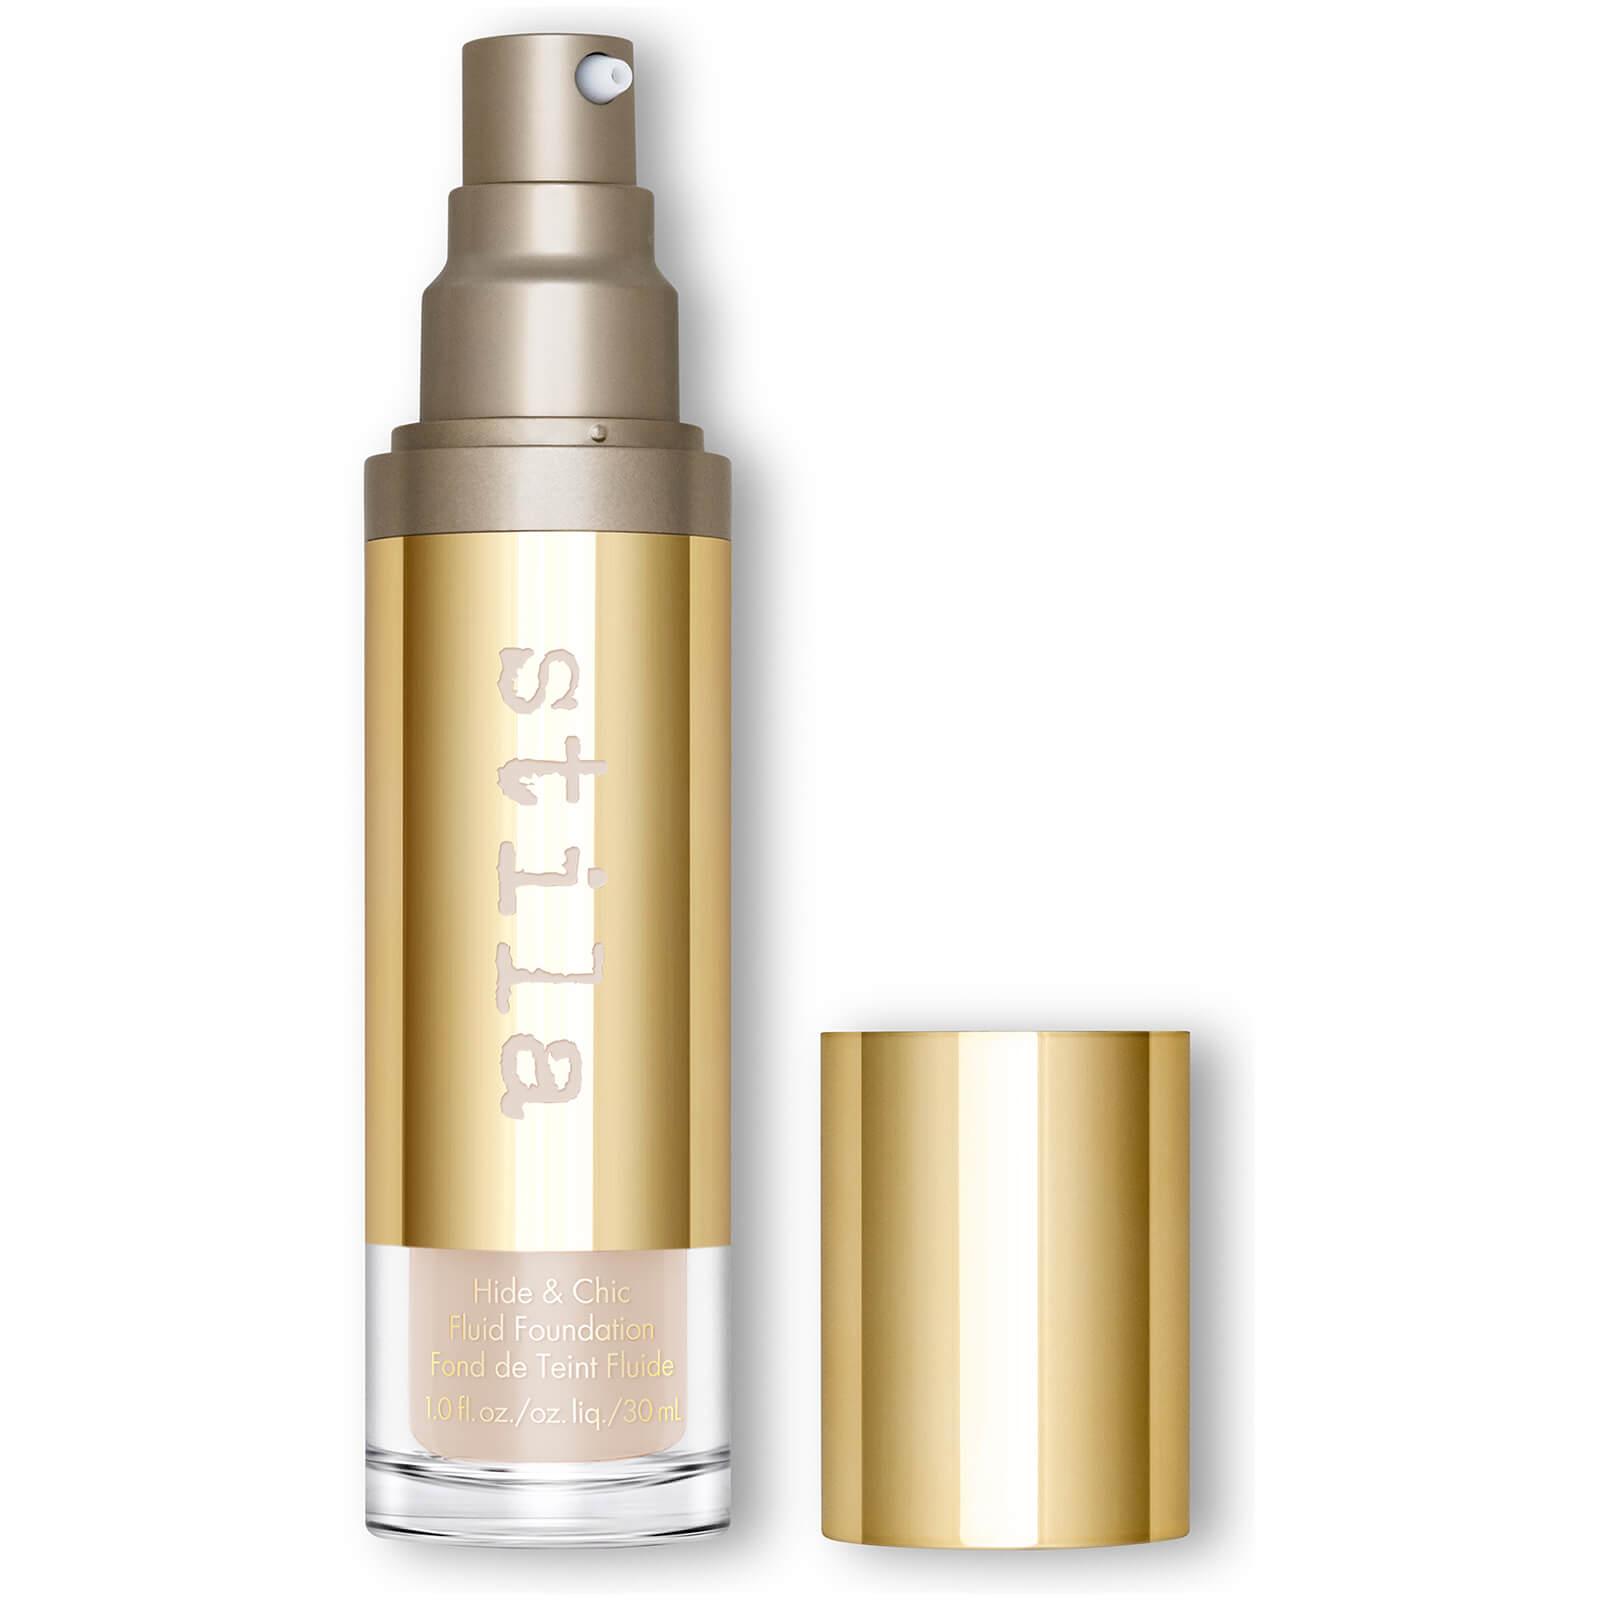 Купить Stila Hide and Chic Fluid Foundation 30ml (Various Shades) - Light 4